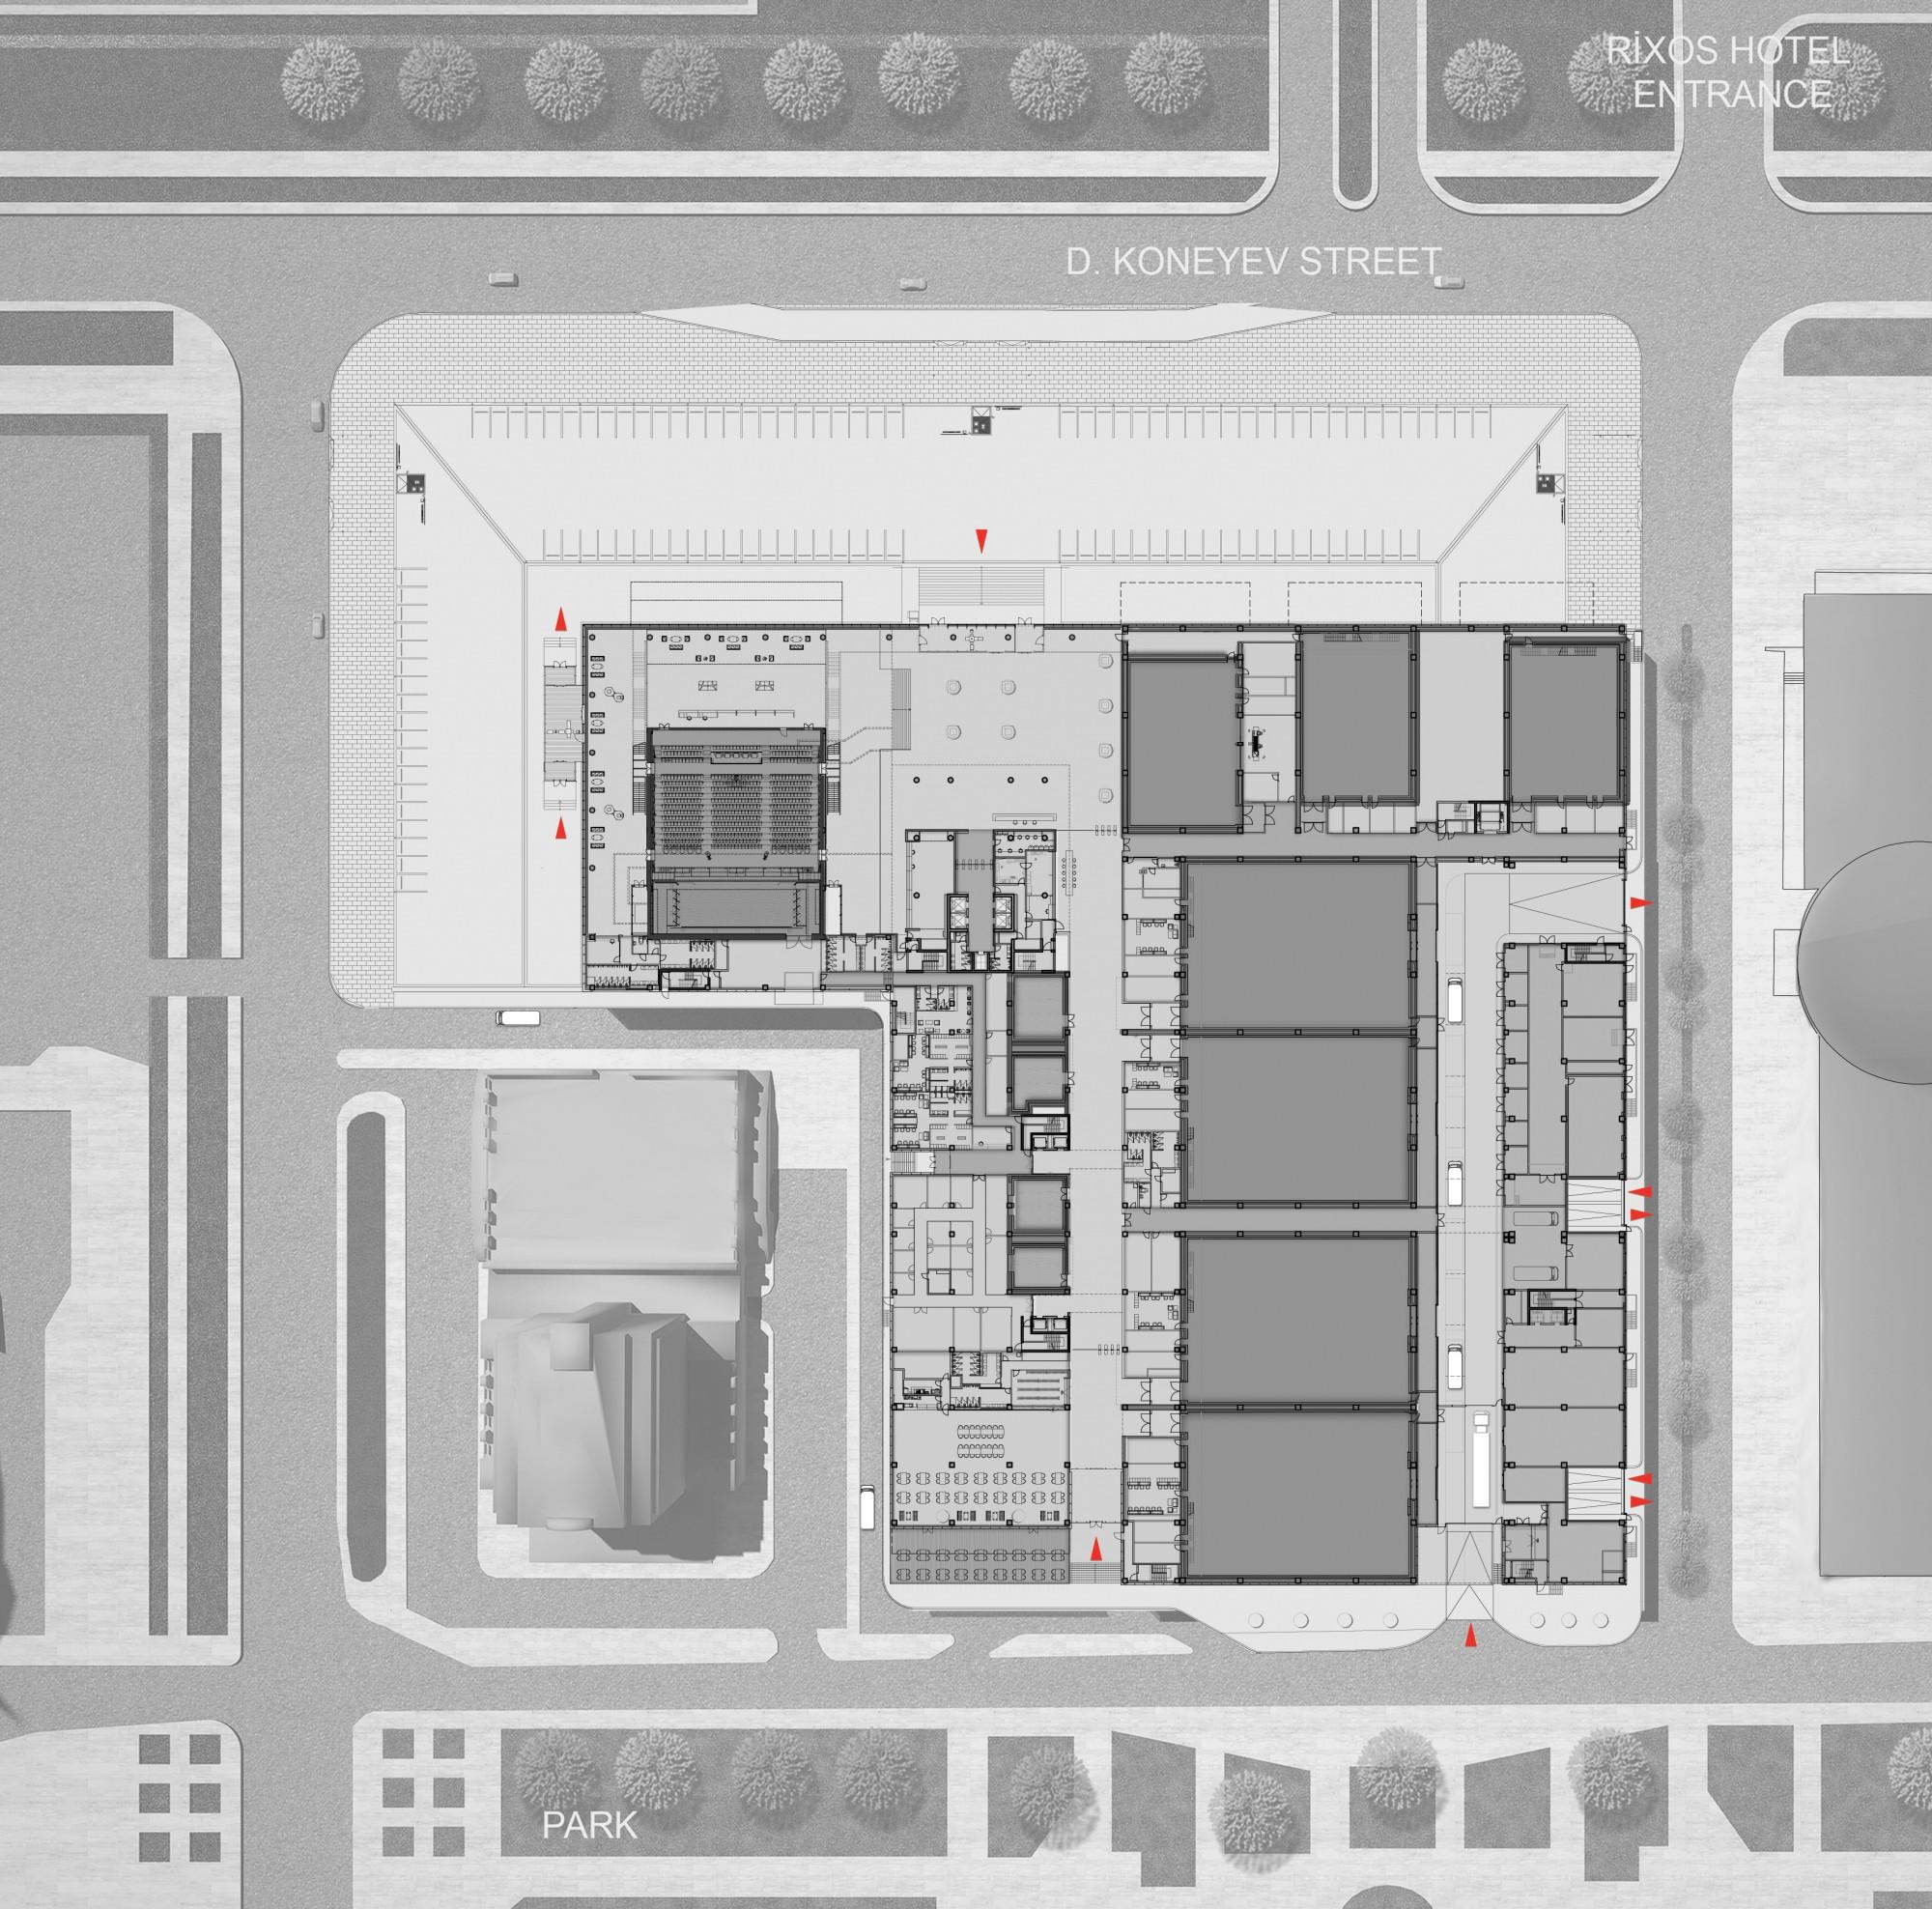 Ground Floor Plan © Tabanlioglu Architects